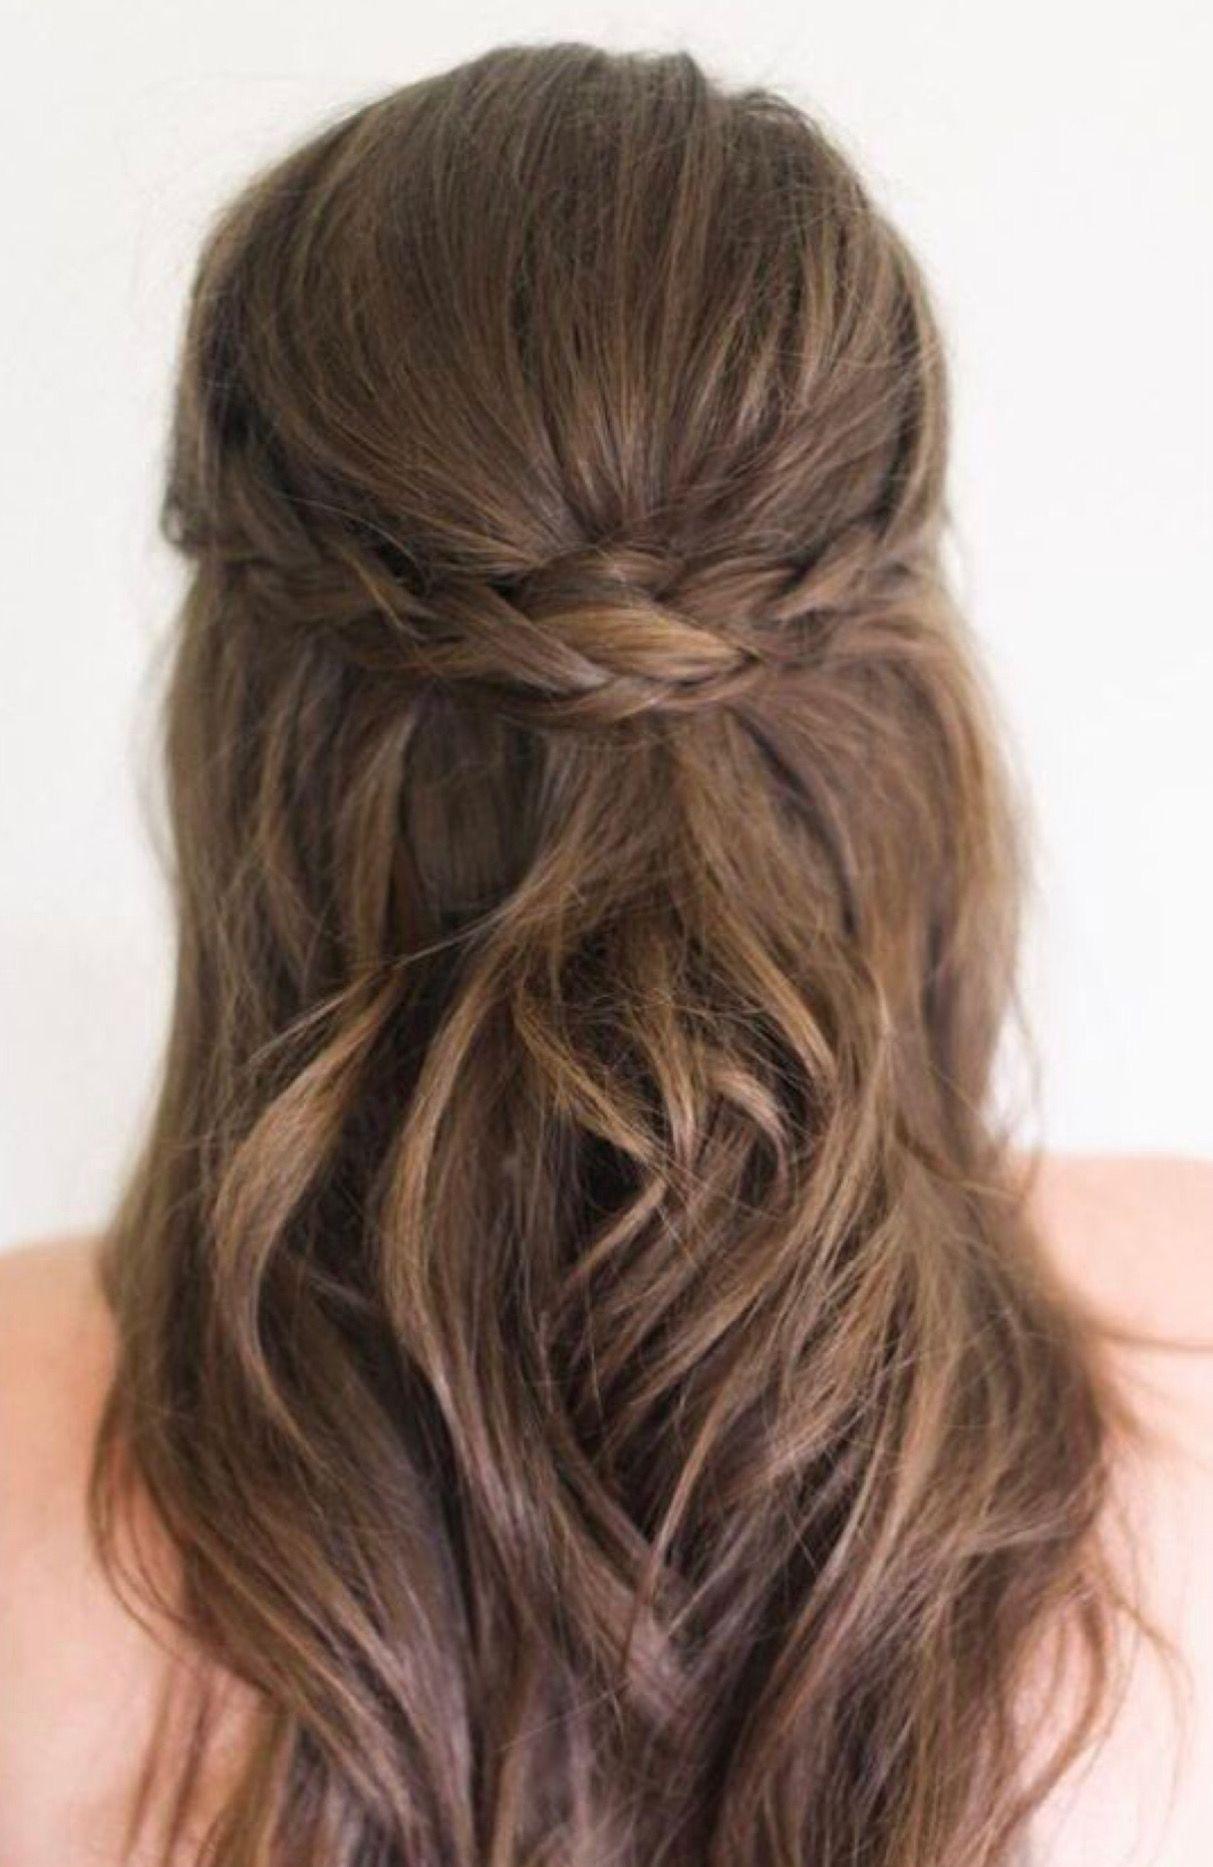 junior bridesmaid | wedding hairstyles in 2019 | wedding